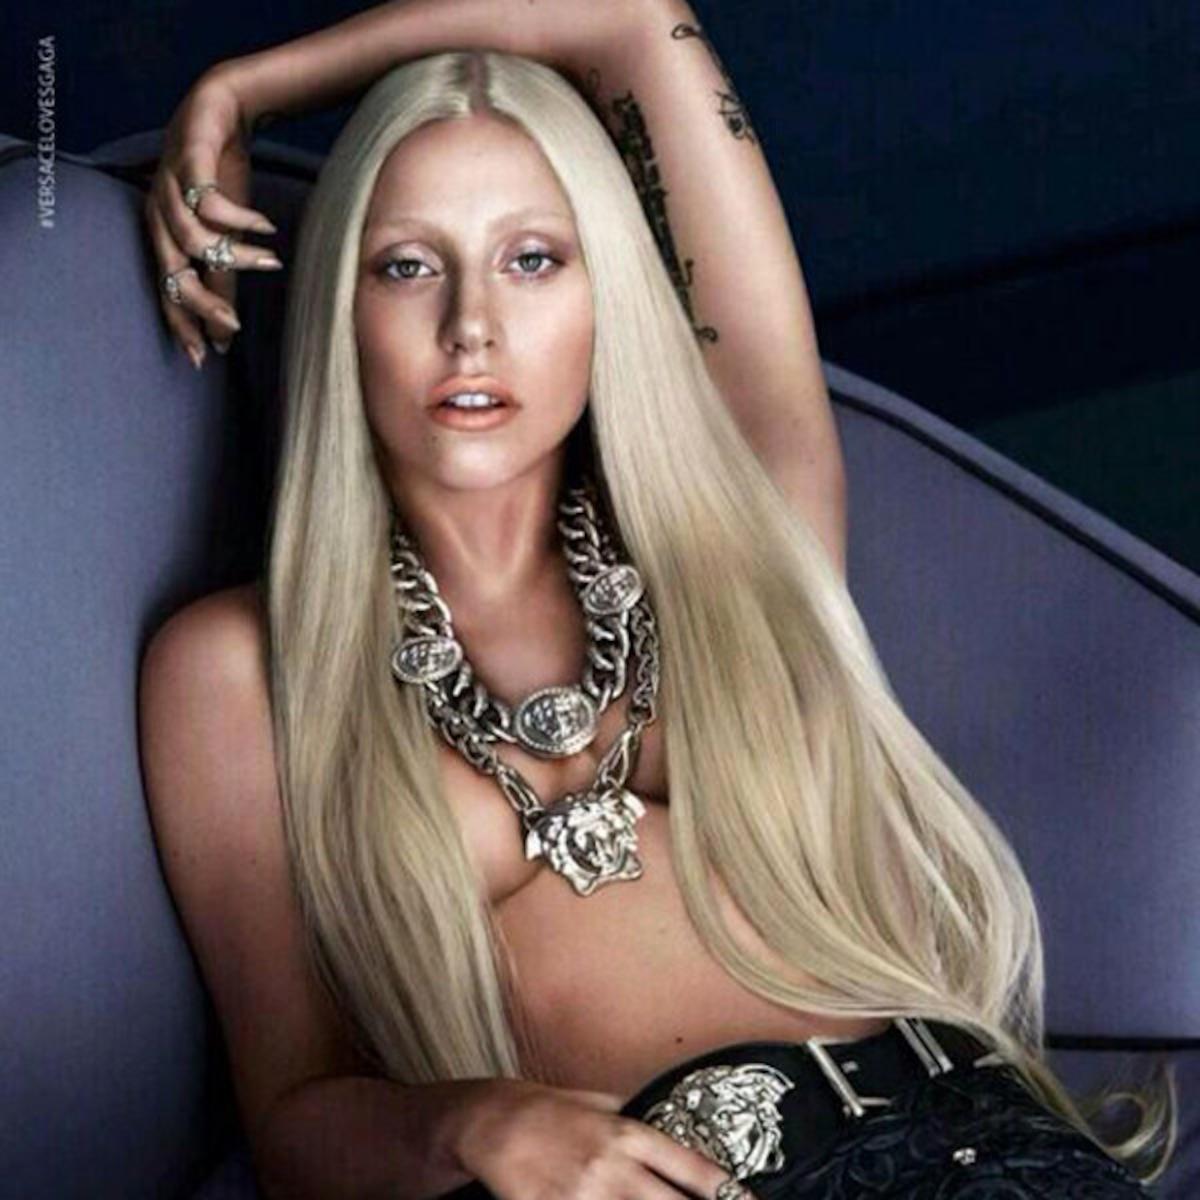 Lady Gaga Sexy Video photo 4